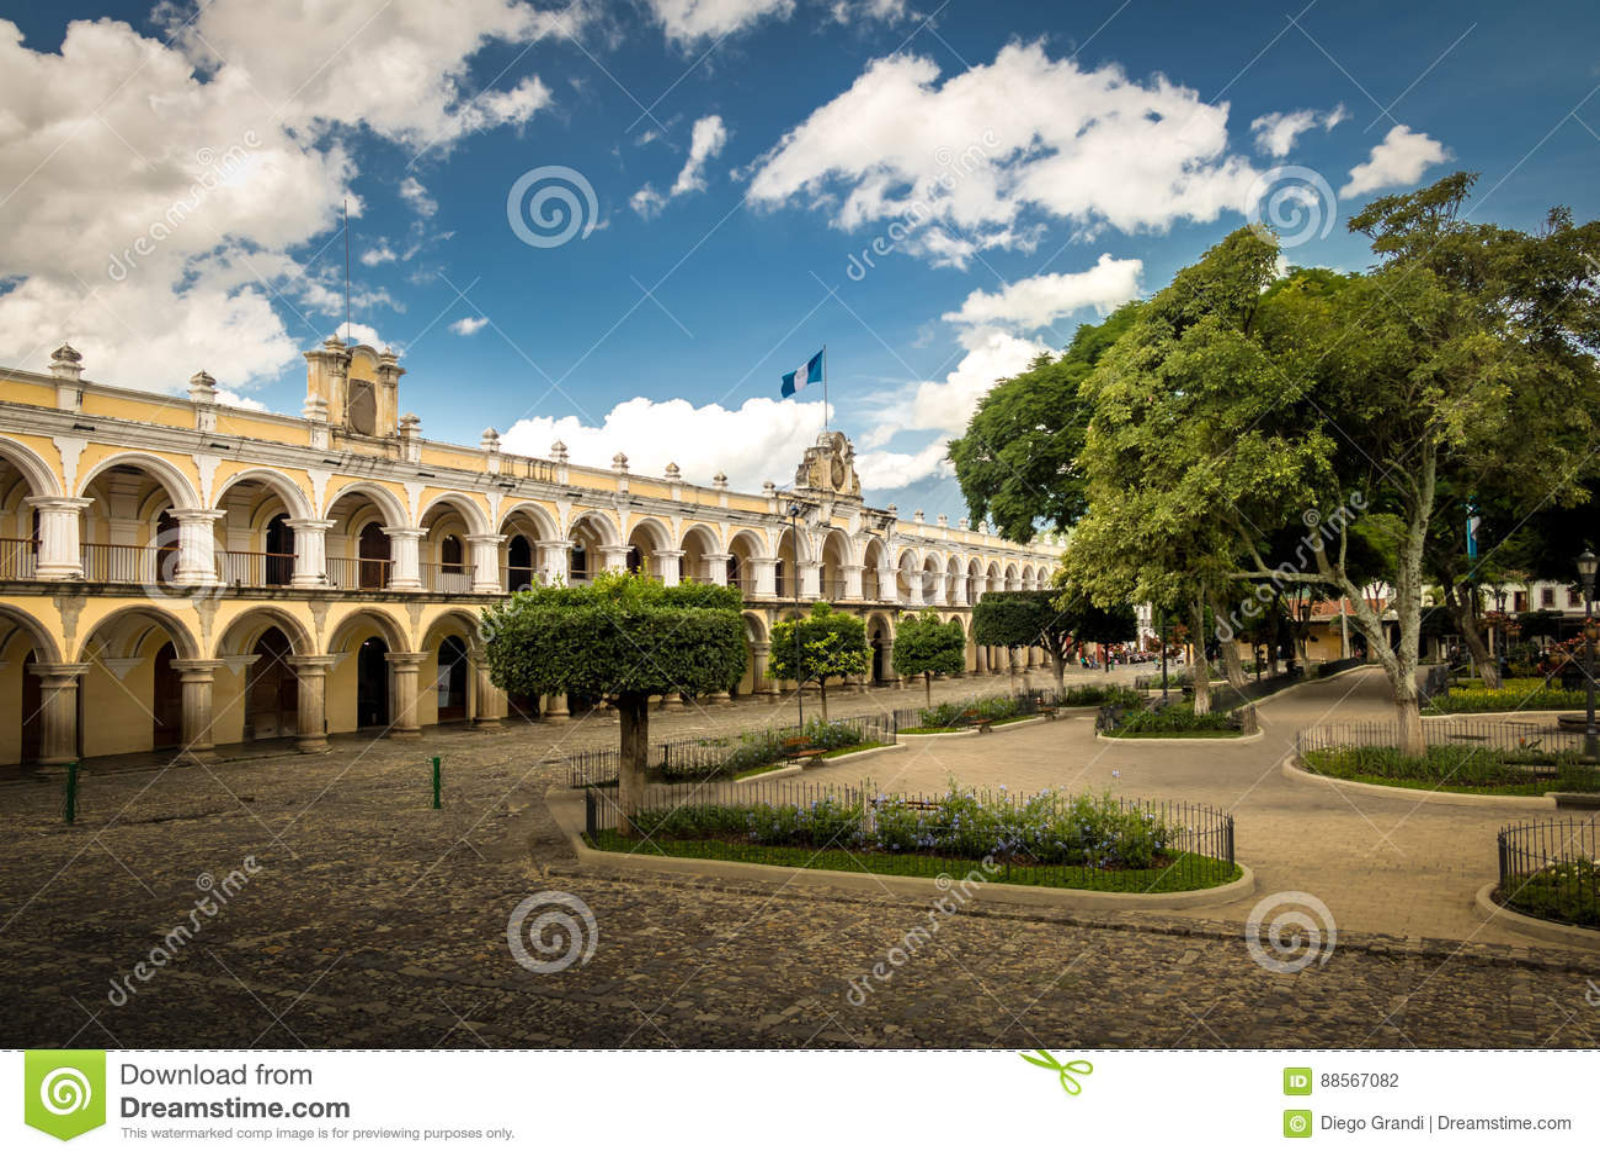 Parque中央和殖民地大厦-安提瓜岛,危地马拉